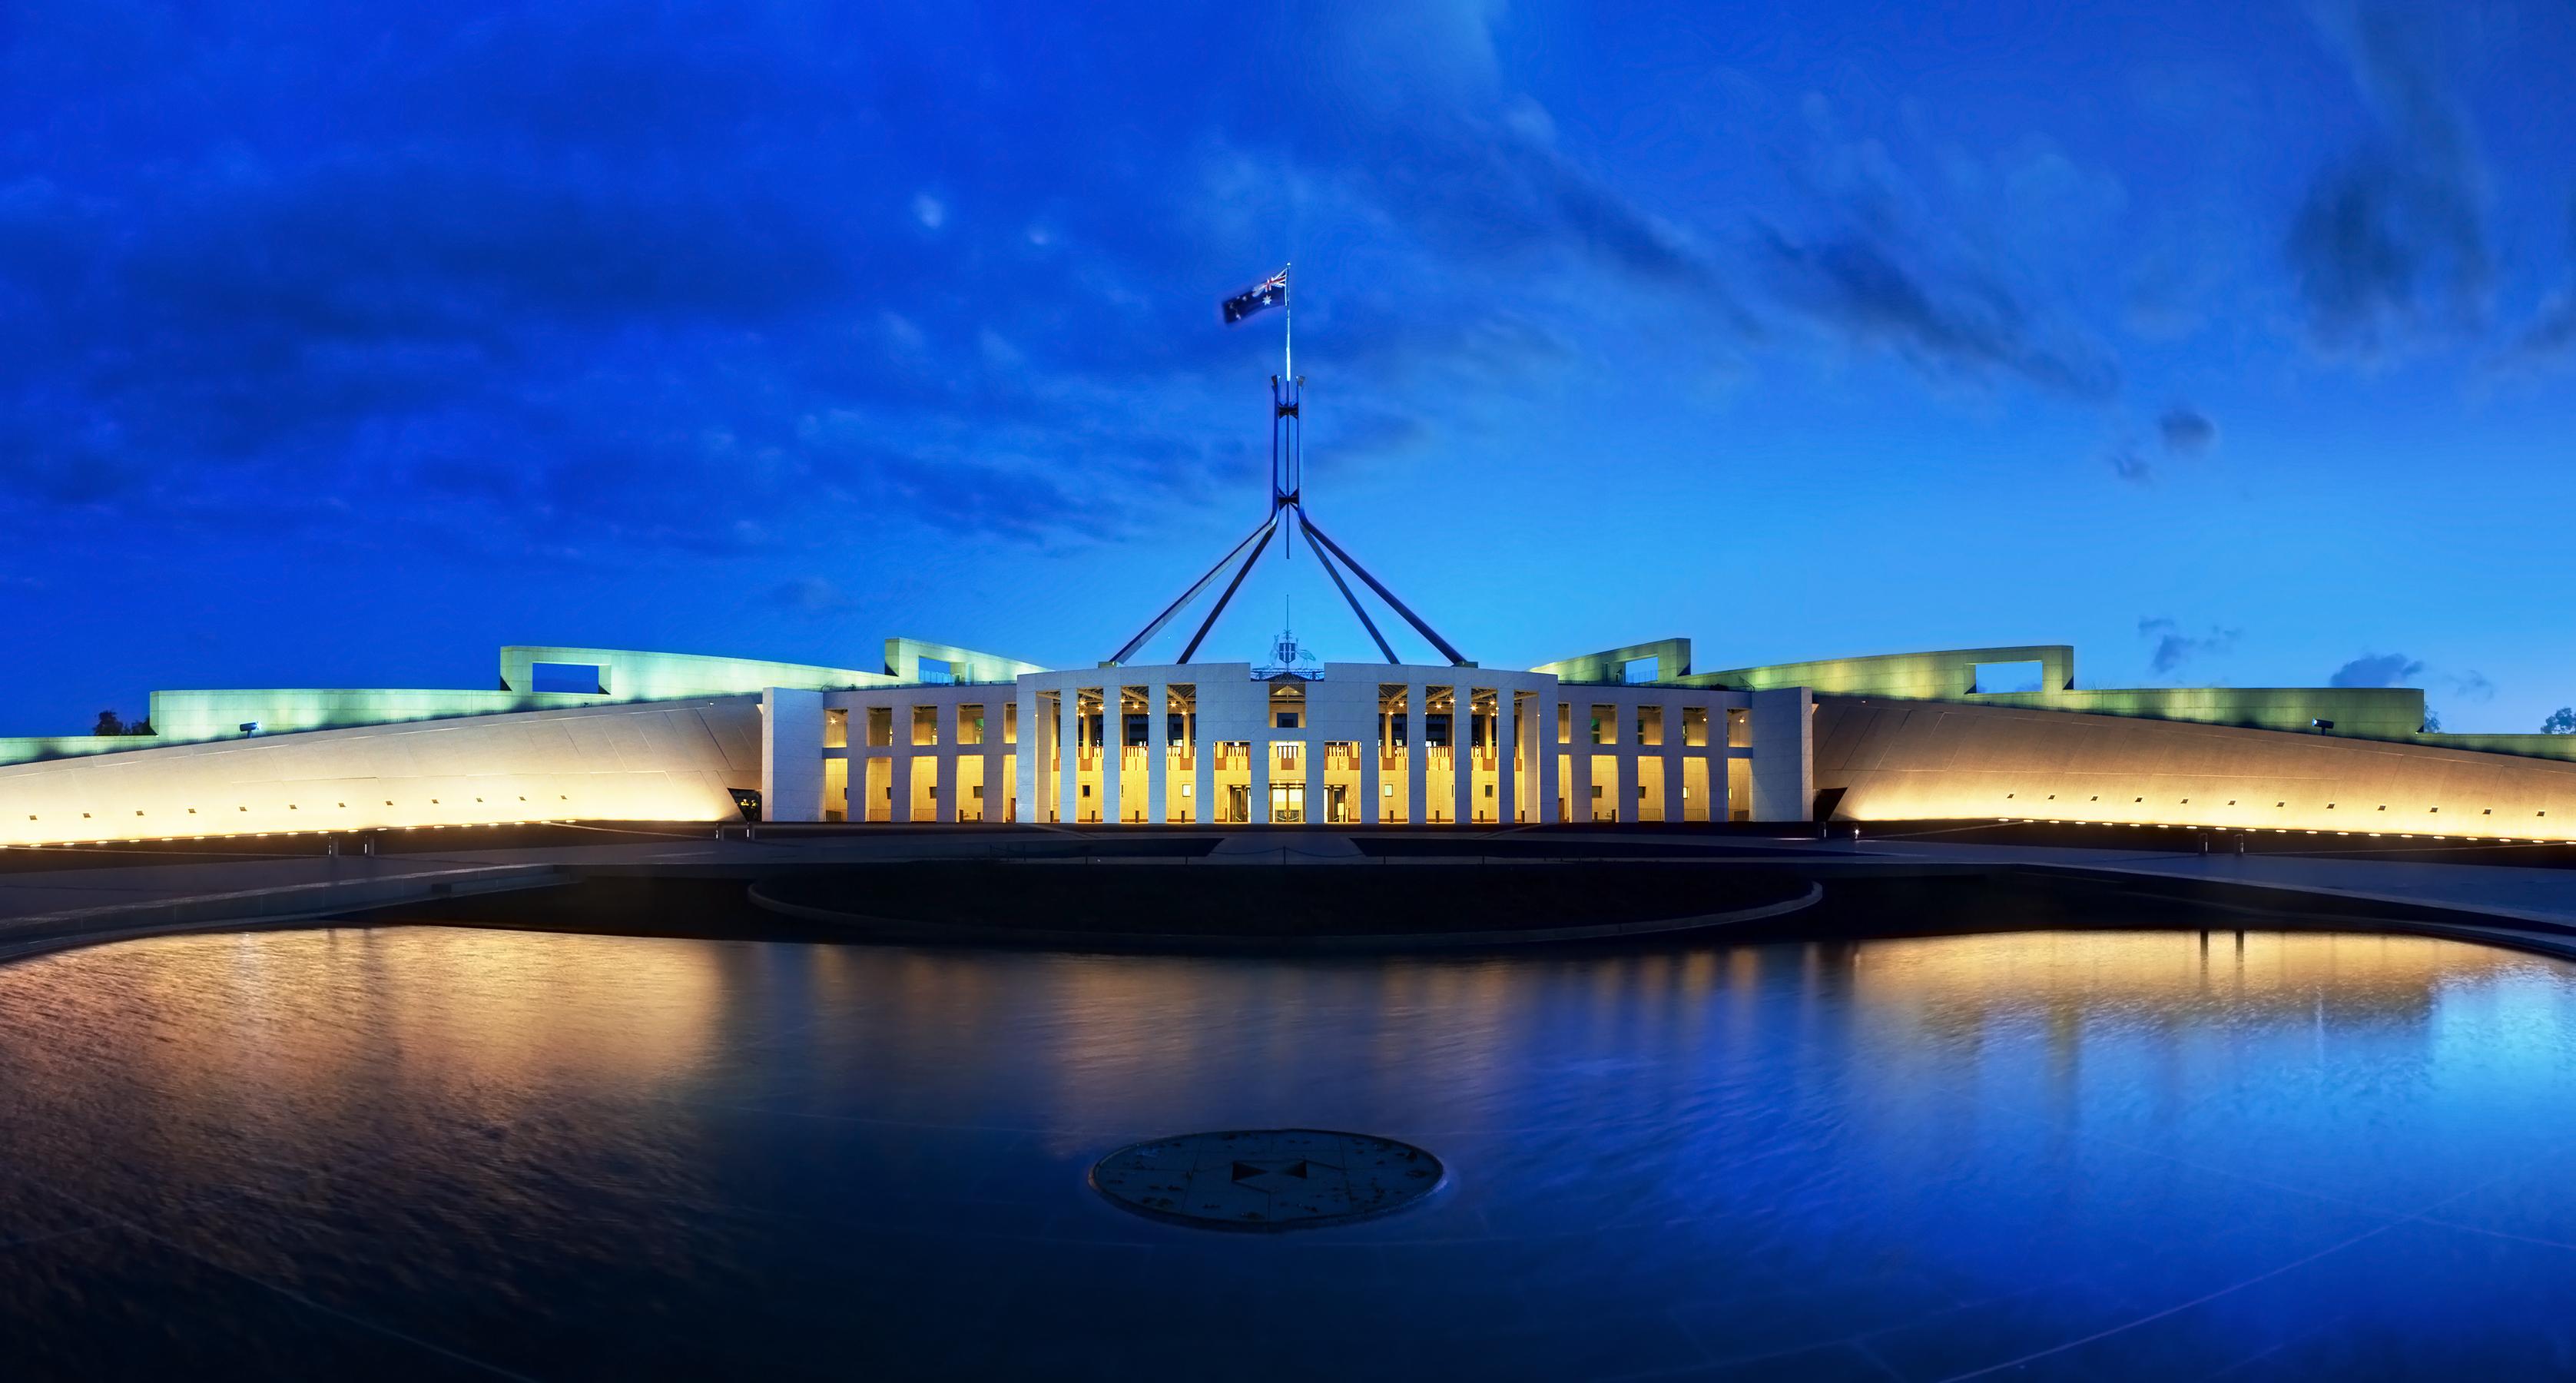 elliott_australia_parliament_canberra_counterterrorism